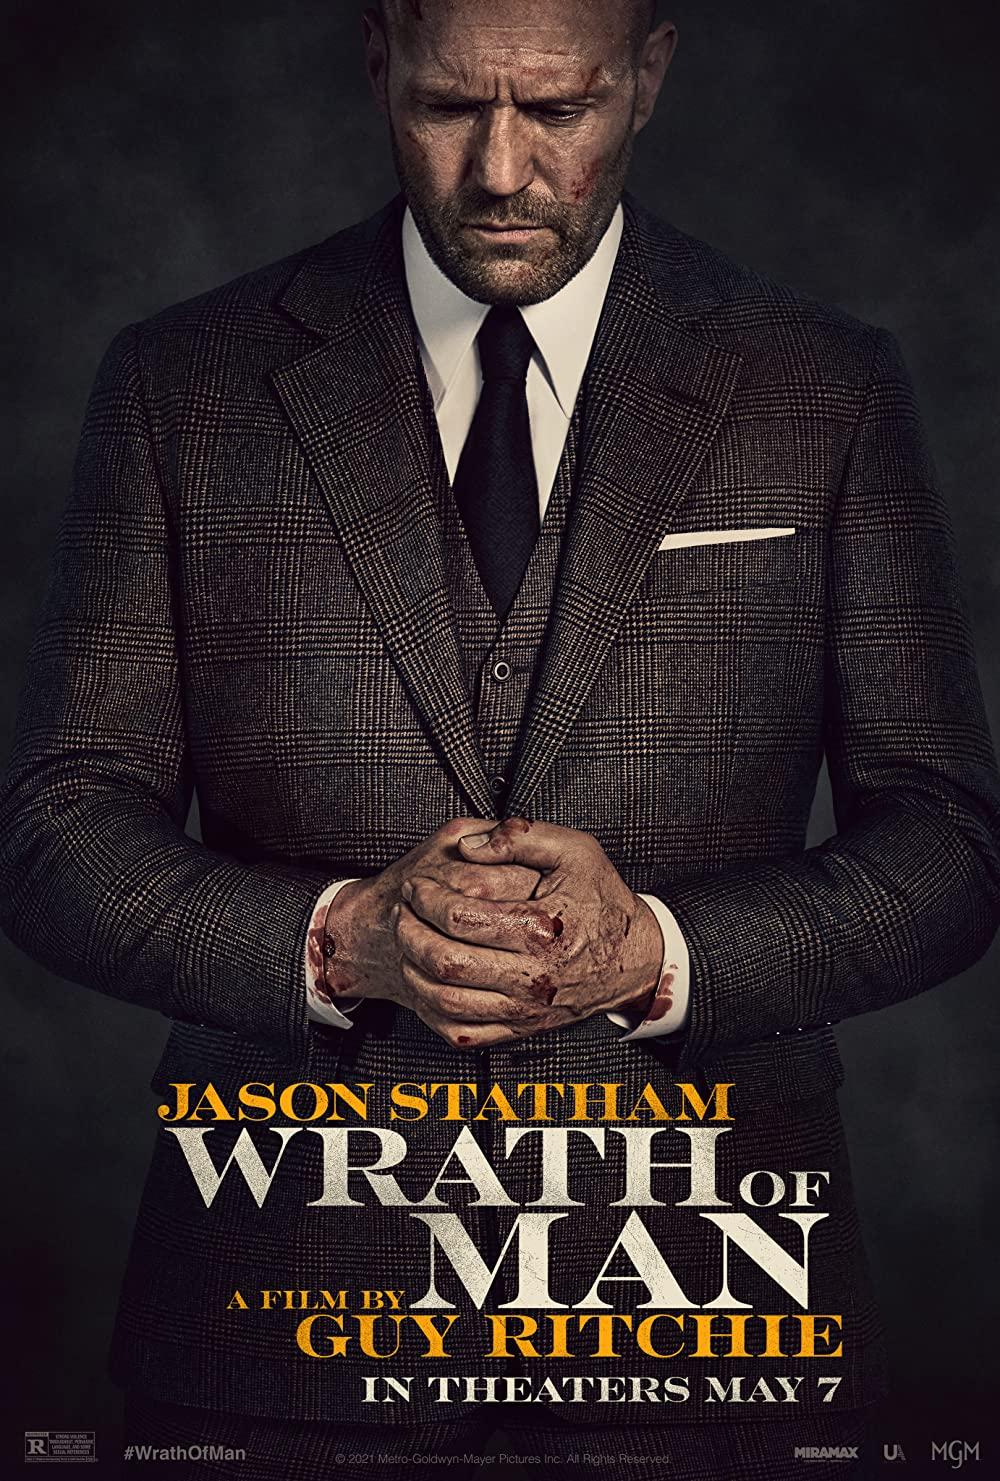 wrath-of-man-jason-statham-movie-poster